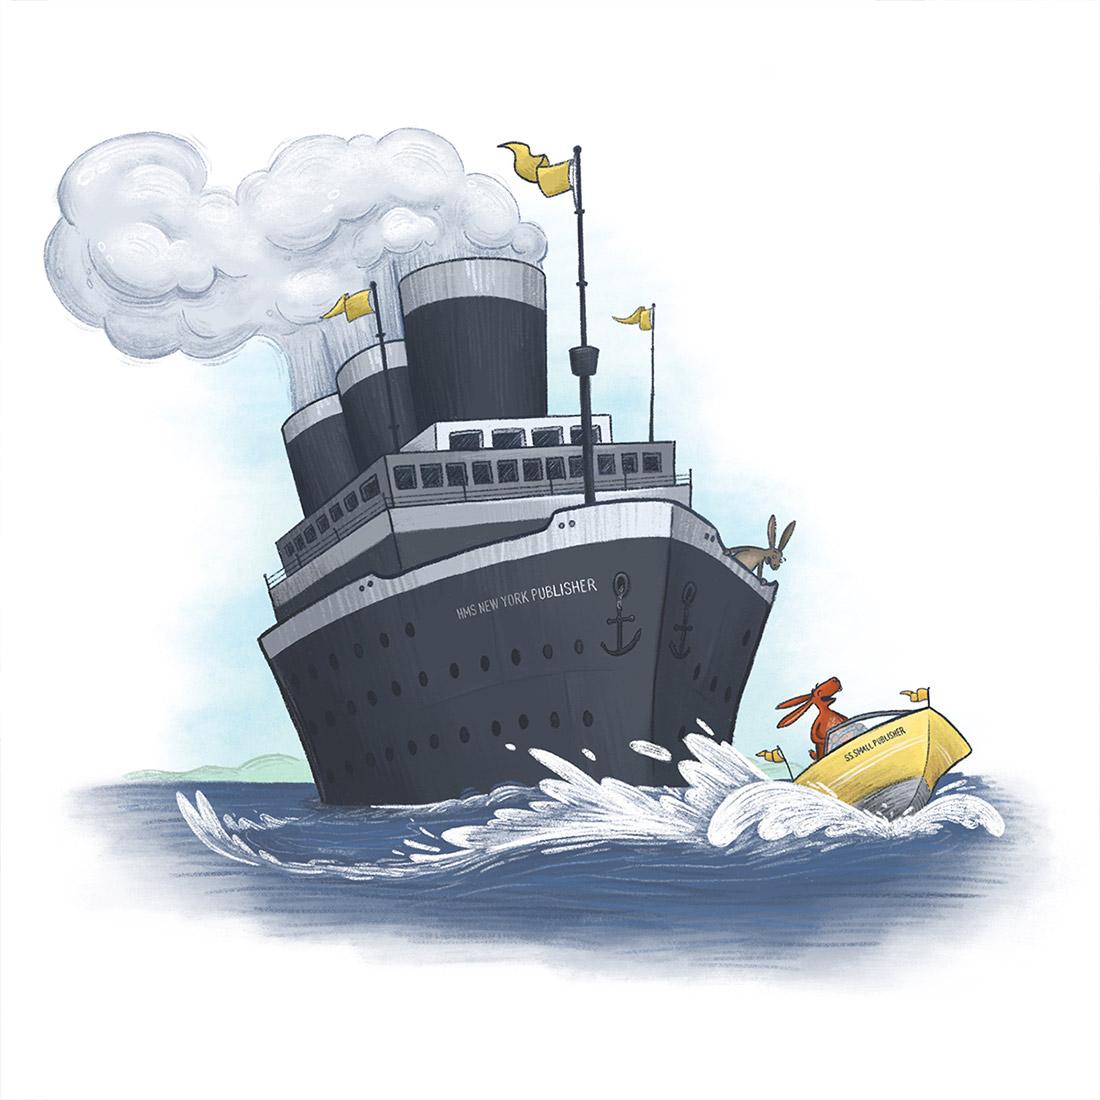 boat podcast art children's book illustration champaign Illinois midwest